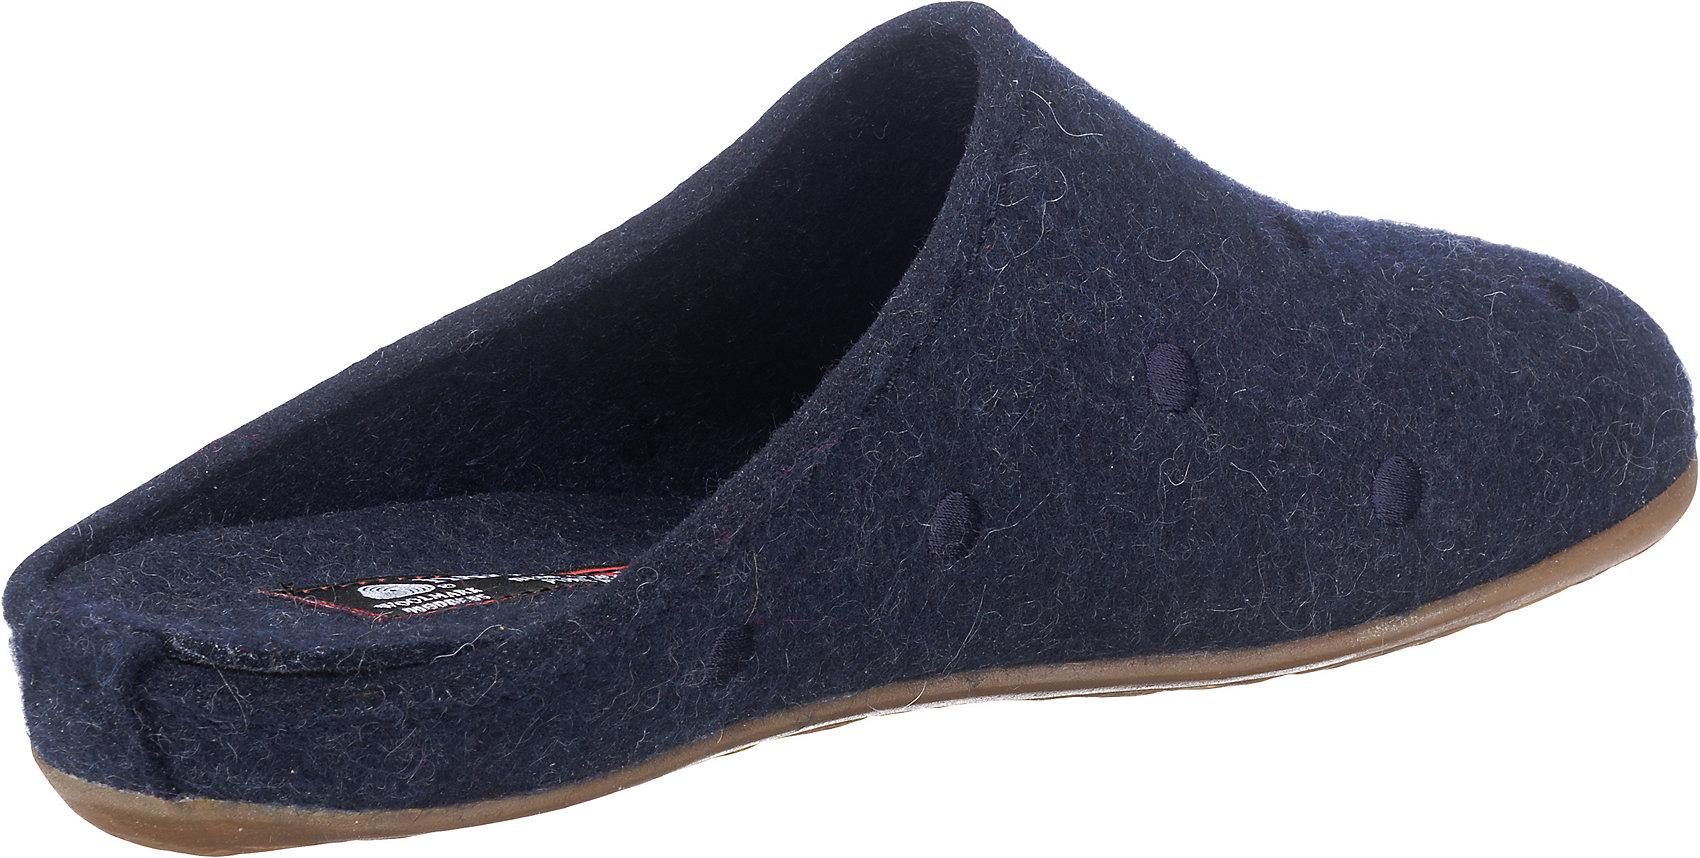 Neu HAFLINGER Noblesse Pantoffeln 6727396 für Damen dunkelblau